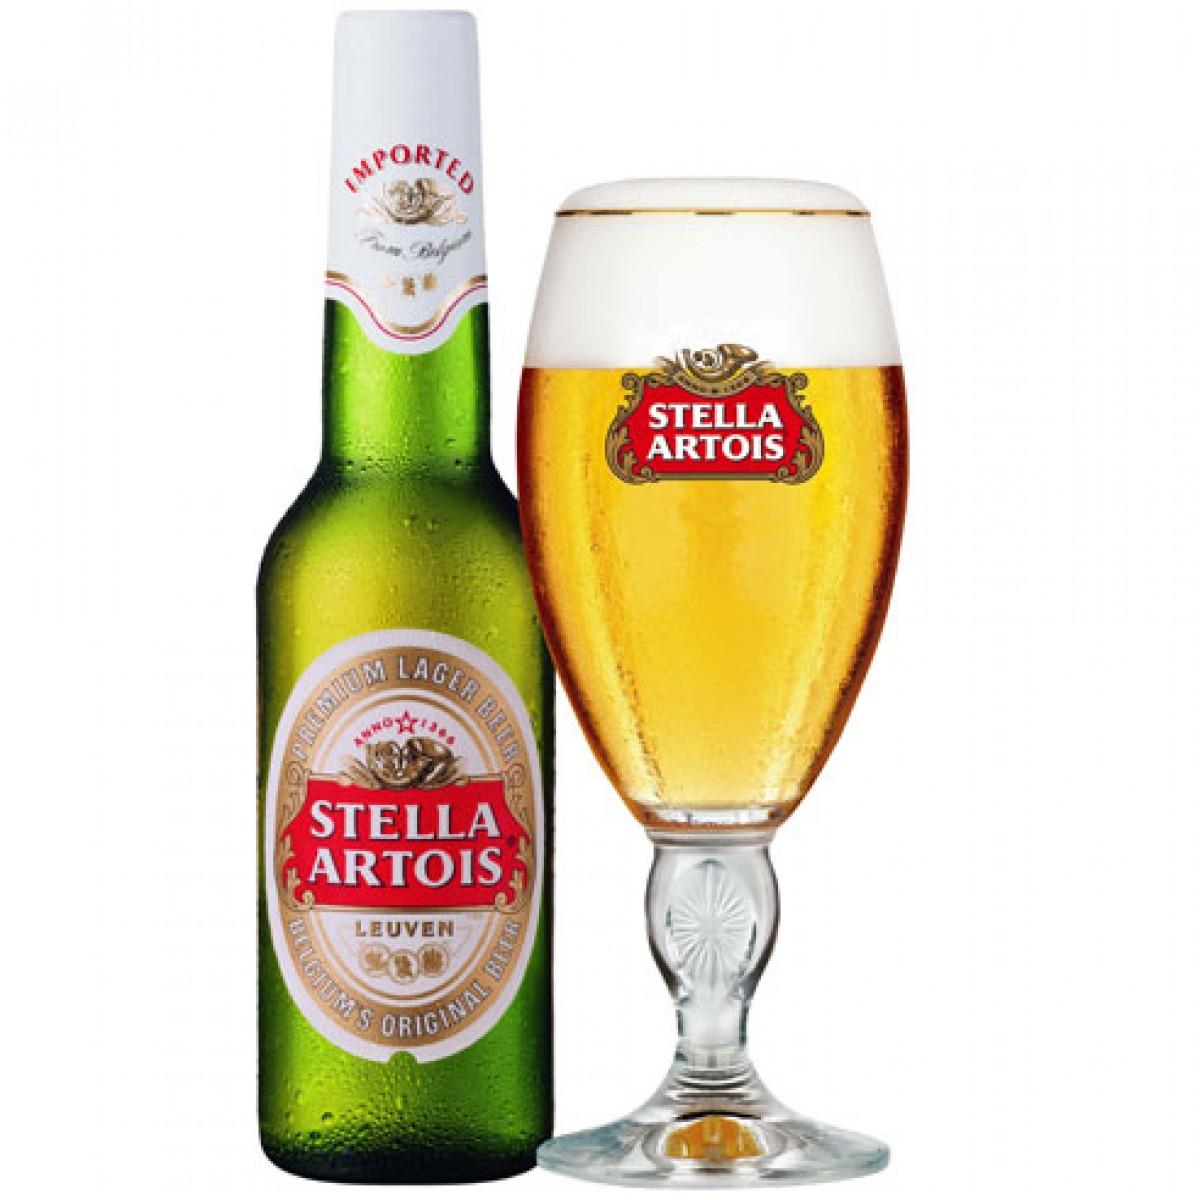 Bia Stella Artois 5% - chai 330 ml